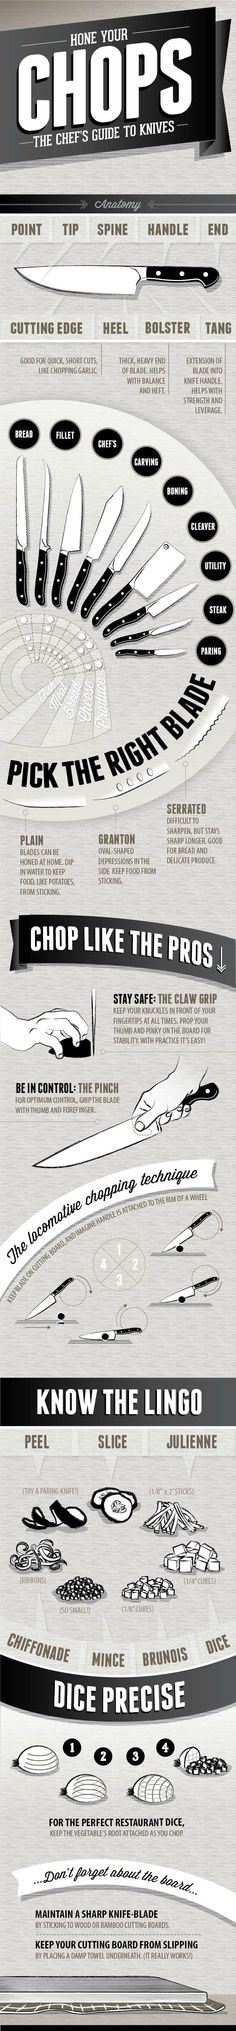 Knife pro-tips!